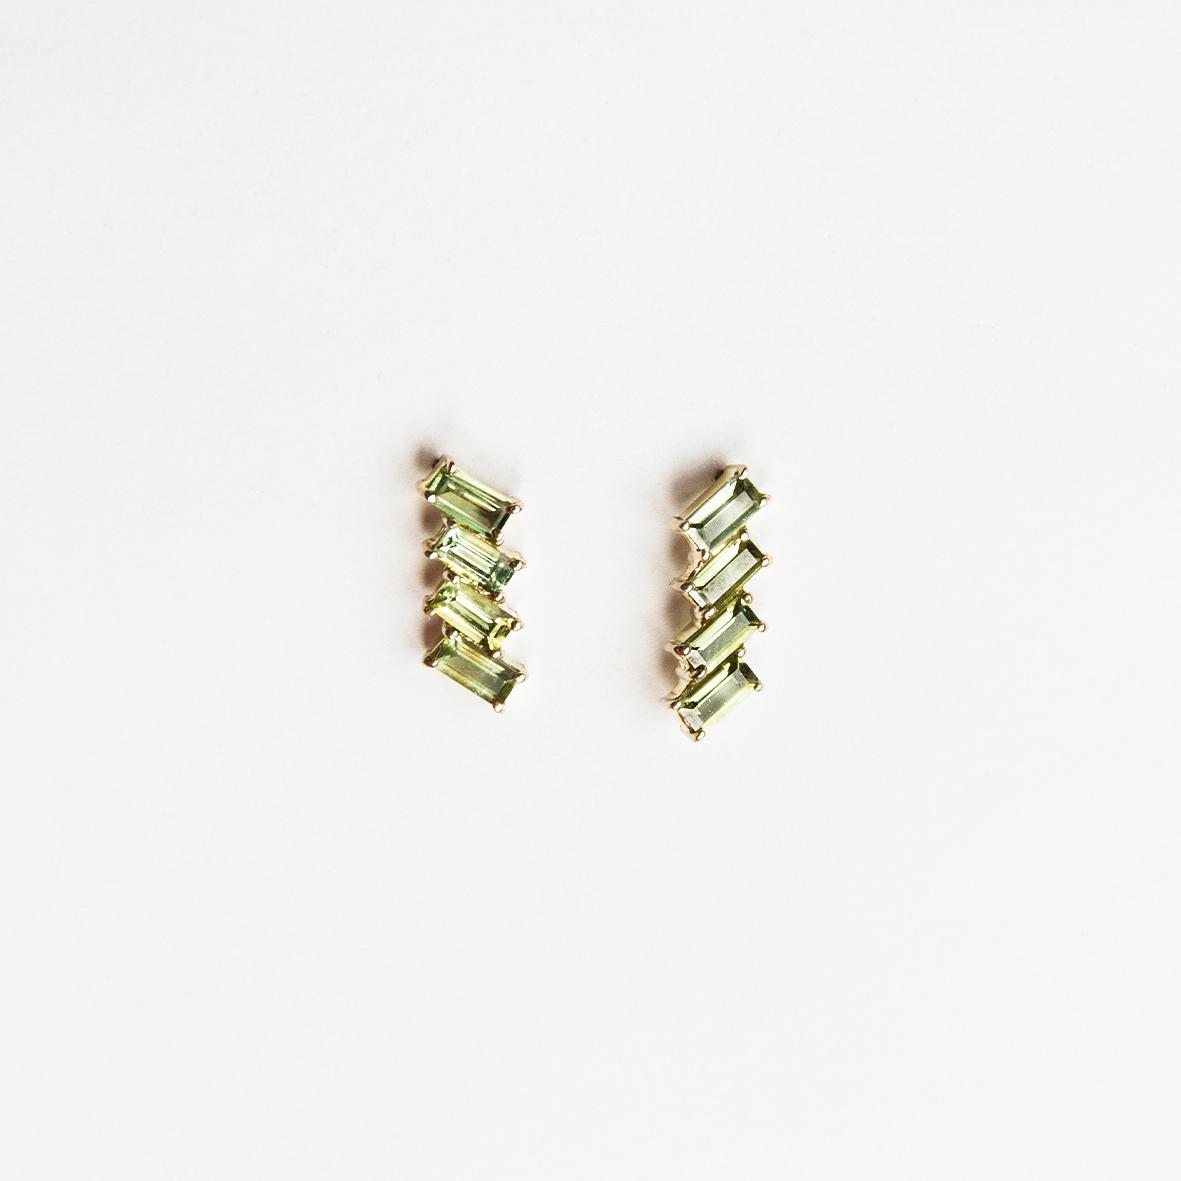 7. OONA_philo_ficha1_deco green sapphire earrings